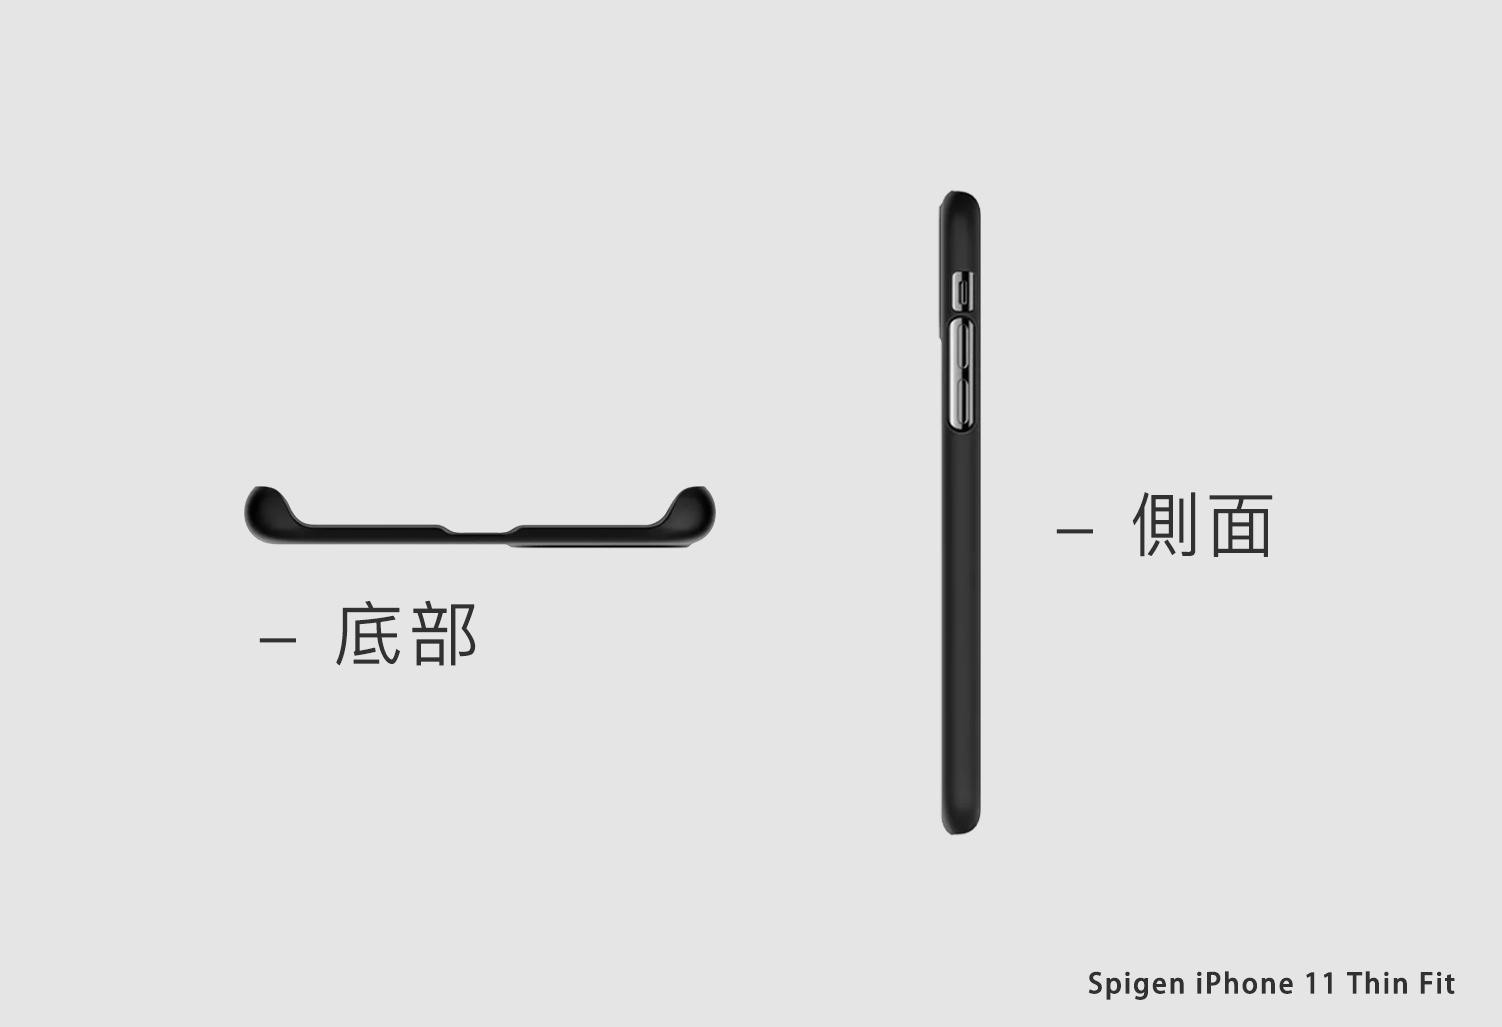 iPhone 11/11 Pro/ 11 Pro Max 手機殼推薦 Spigen